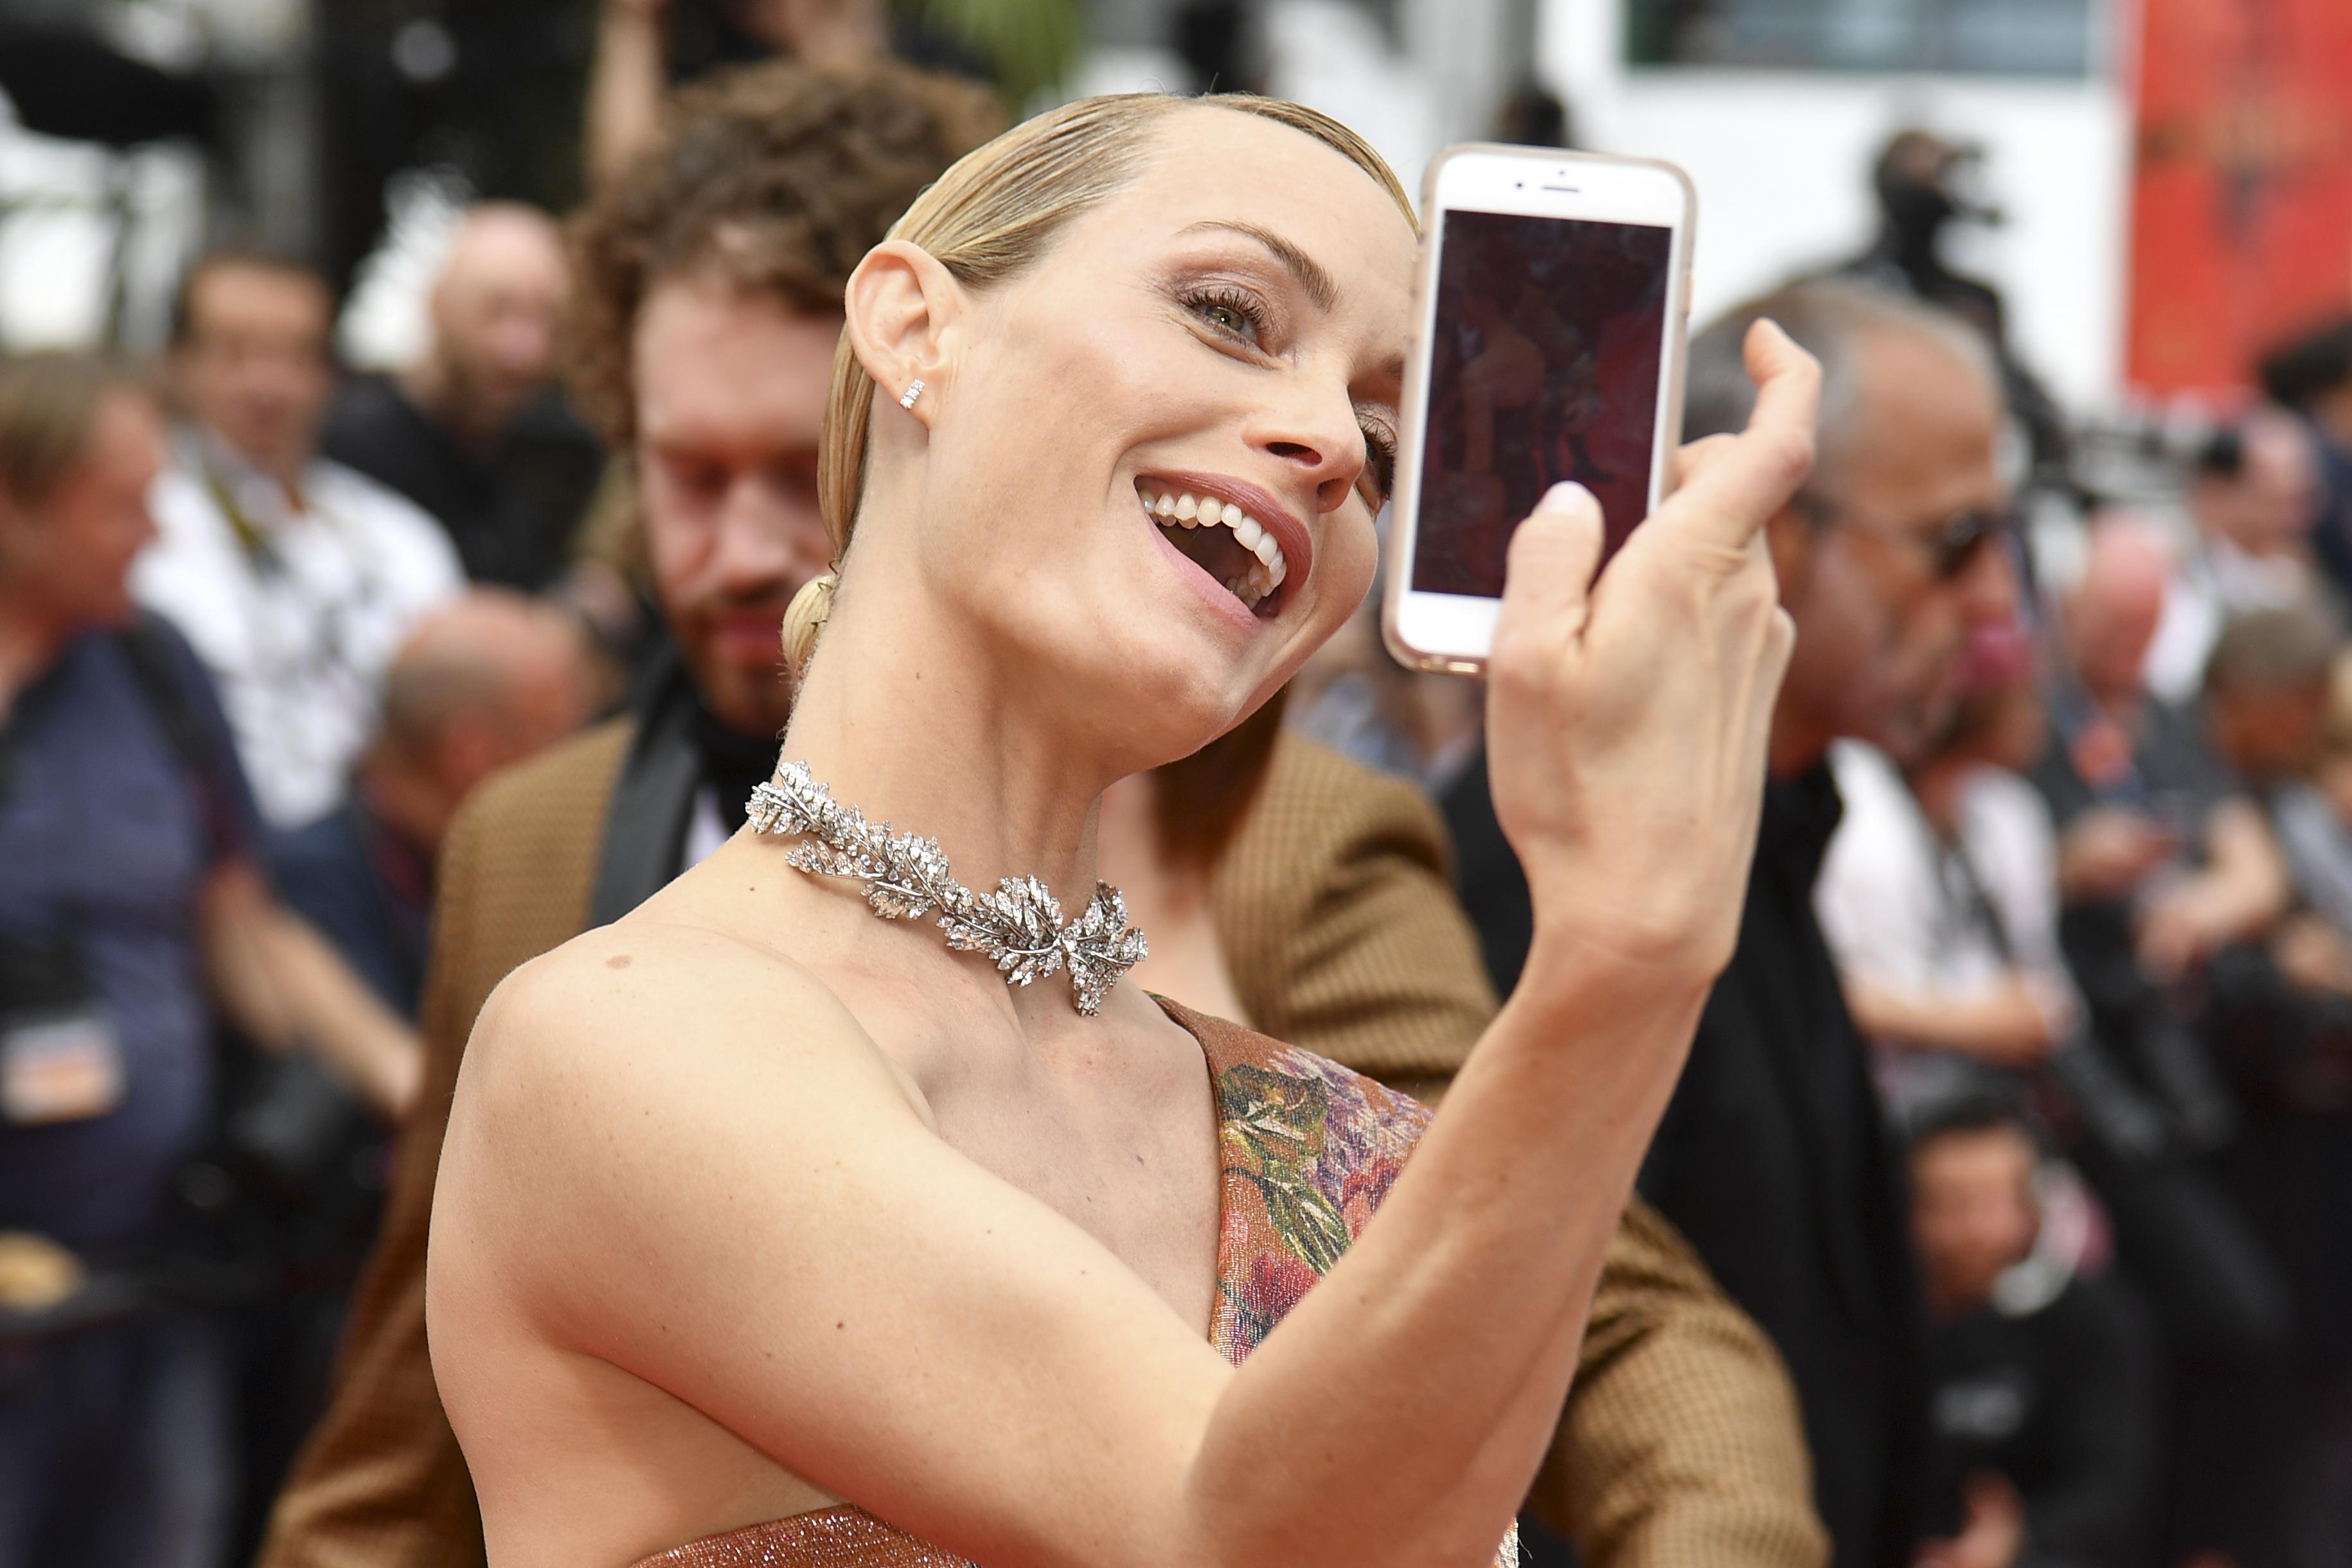 Modelo Amber Valletta en el Festival de Cannes de 2017 | Alberto Pizzoli | Agence France-Presse